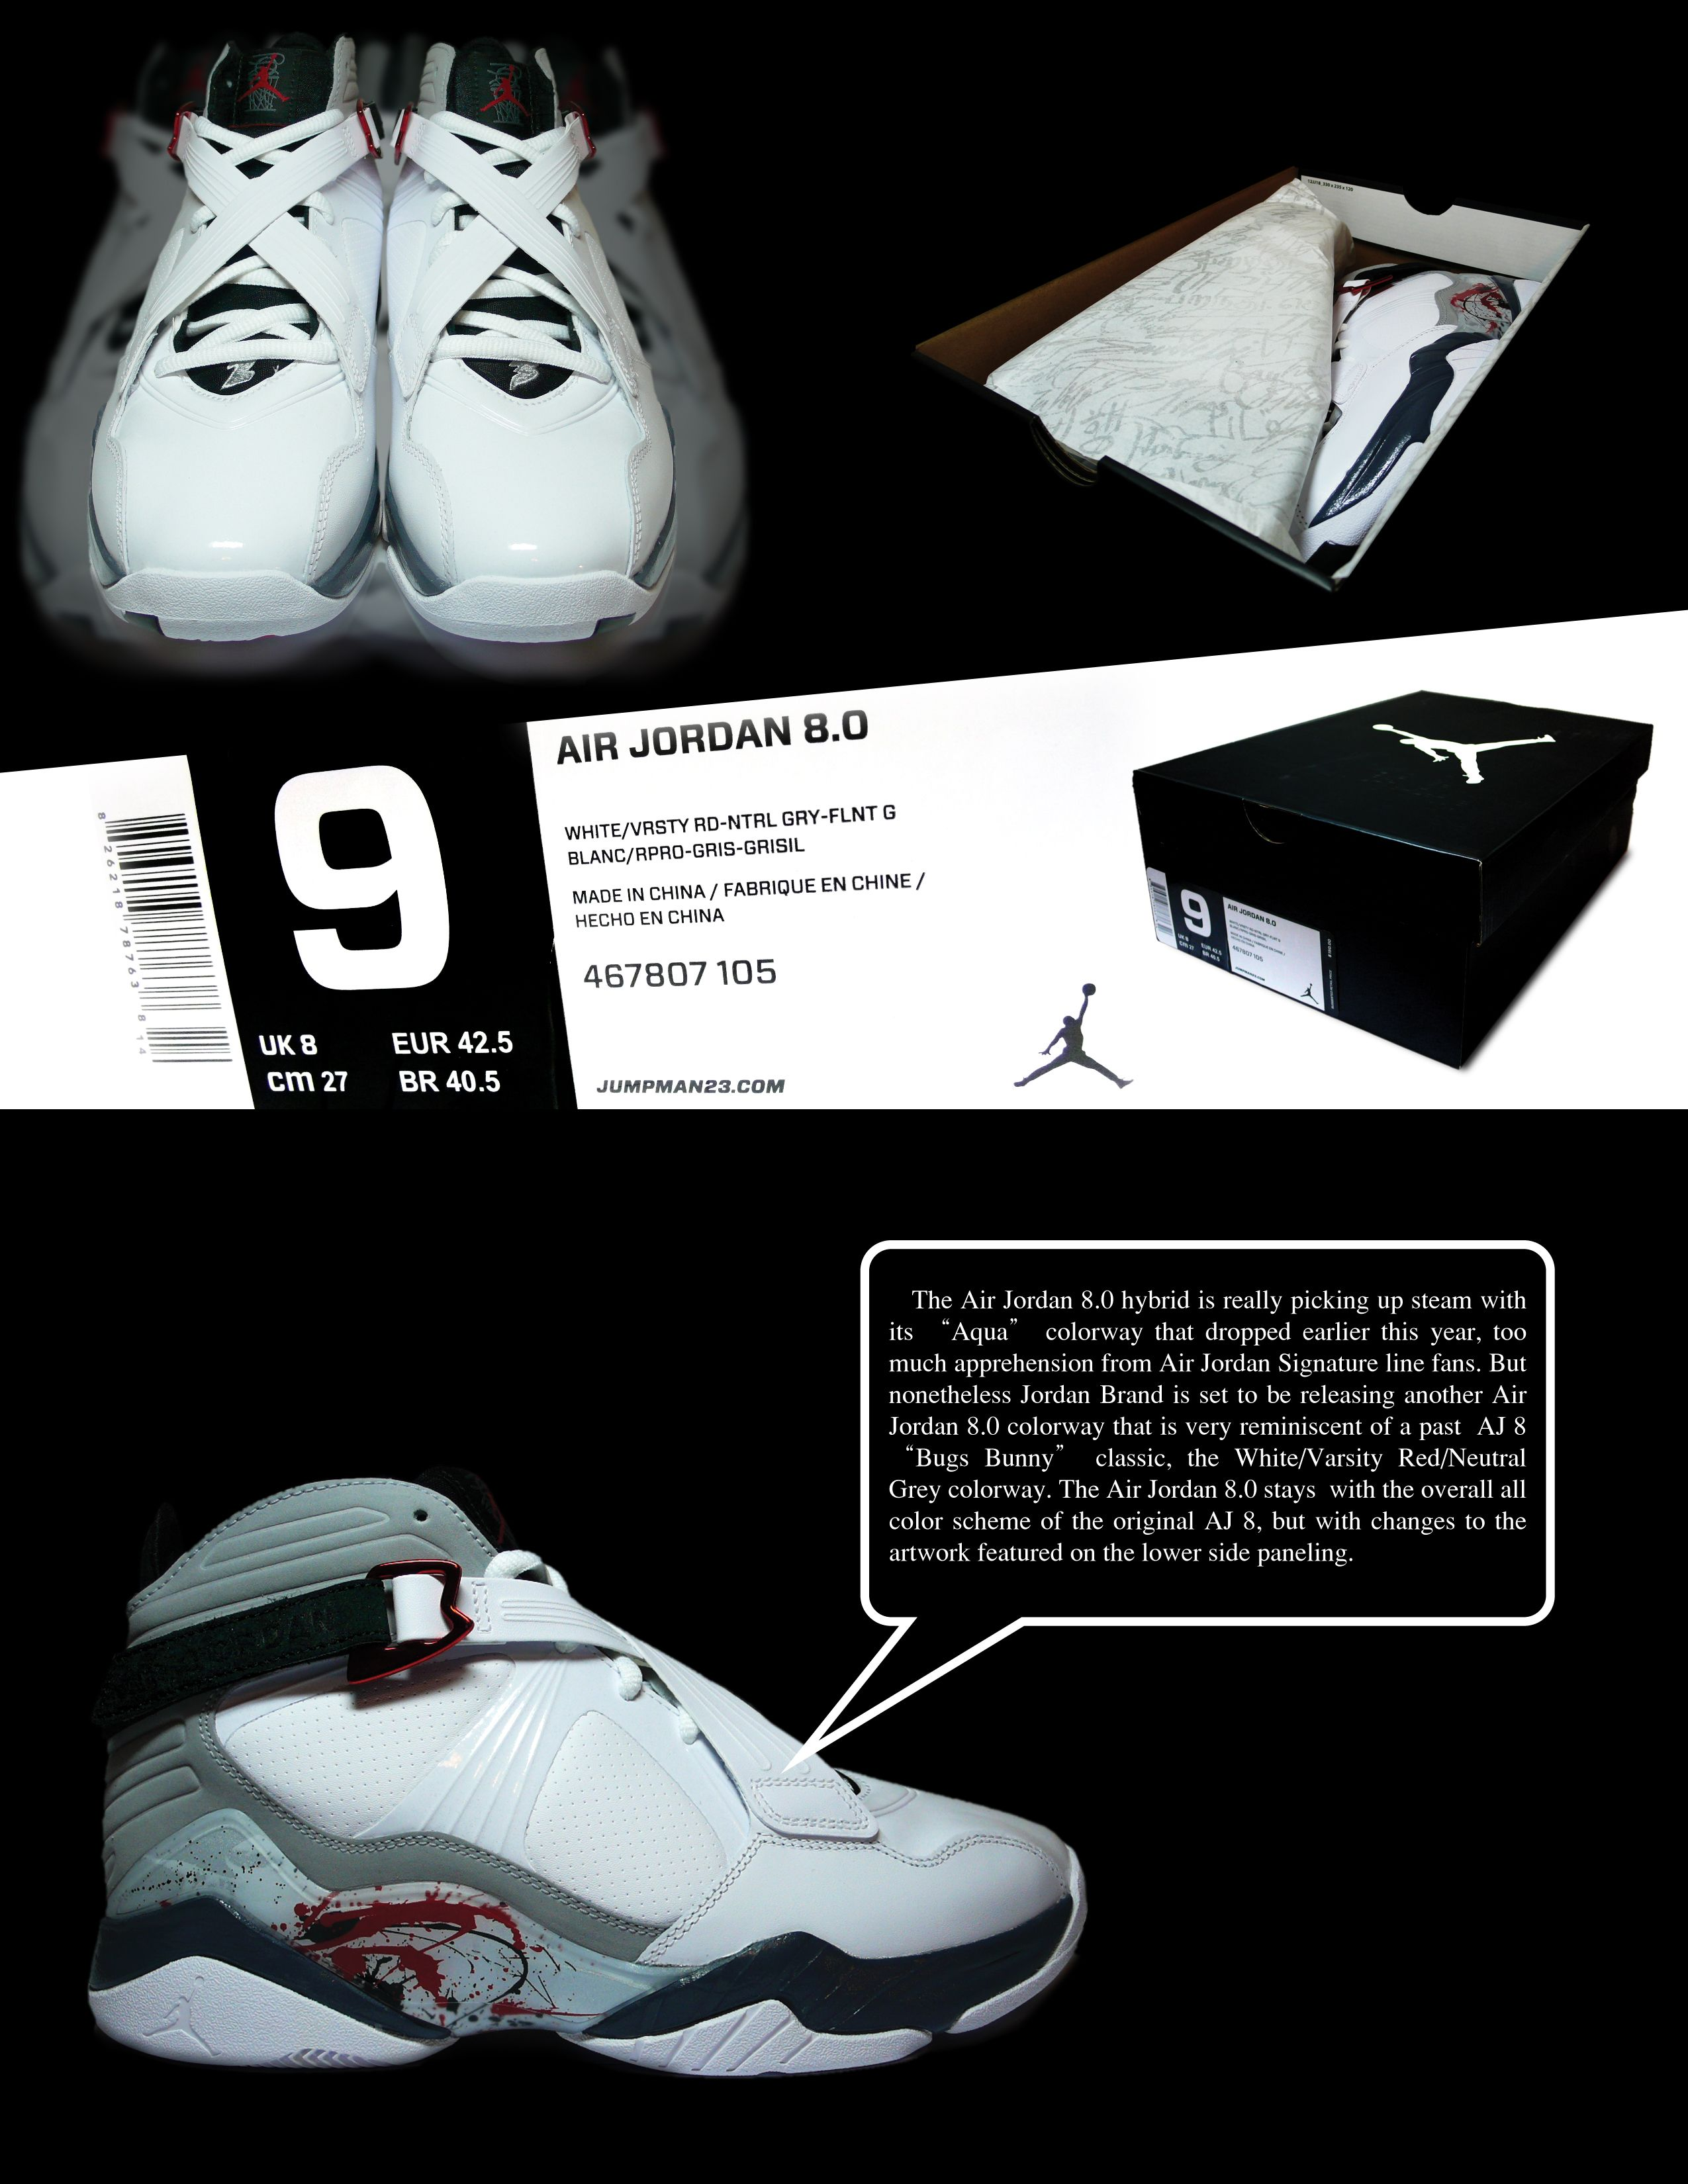 Air Jordan 8.0 - White - Varsity Red - Neutral Grey - SneakerNews ... 6cc8a2dc3f21